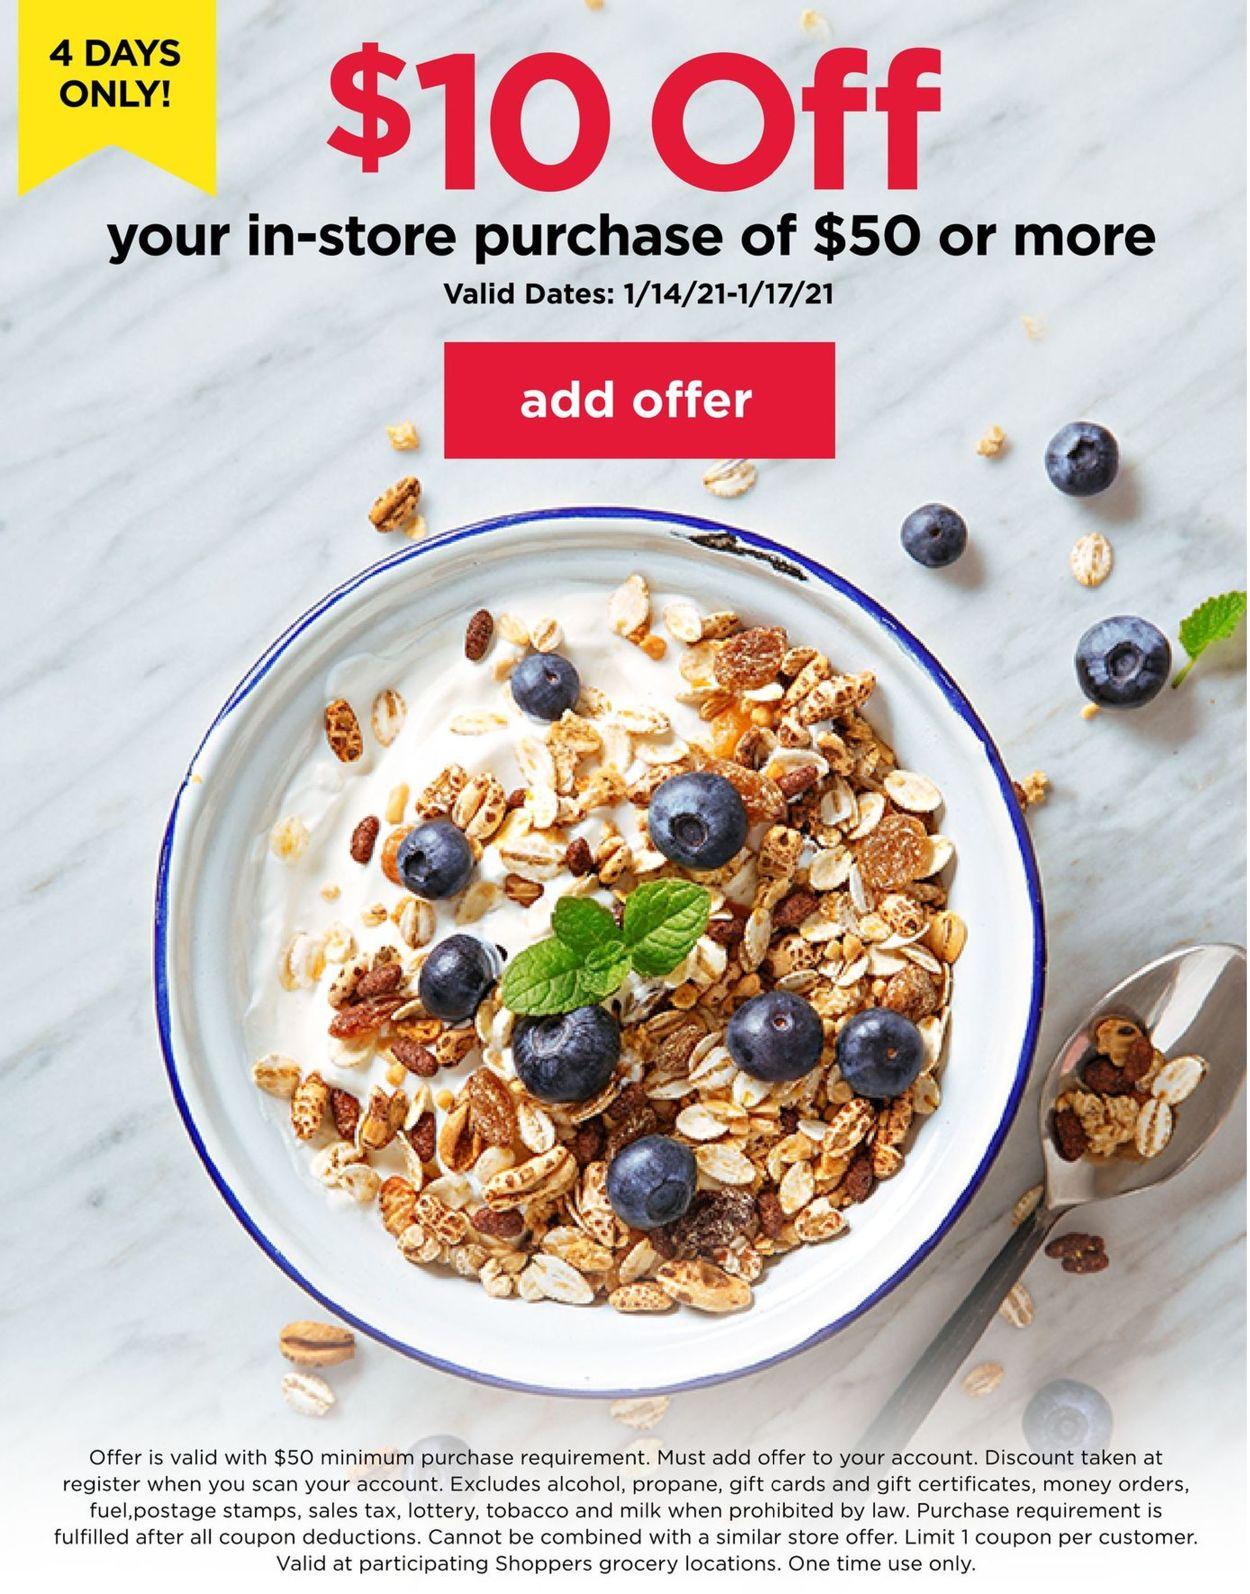 Shoppers Food & Pharmacy 10$ off 2021 Weekly Ad Circular - valid 01/14-01/17/2021